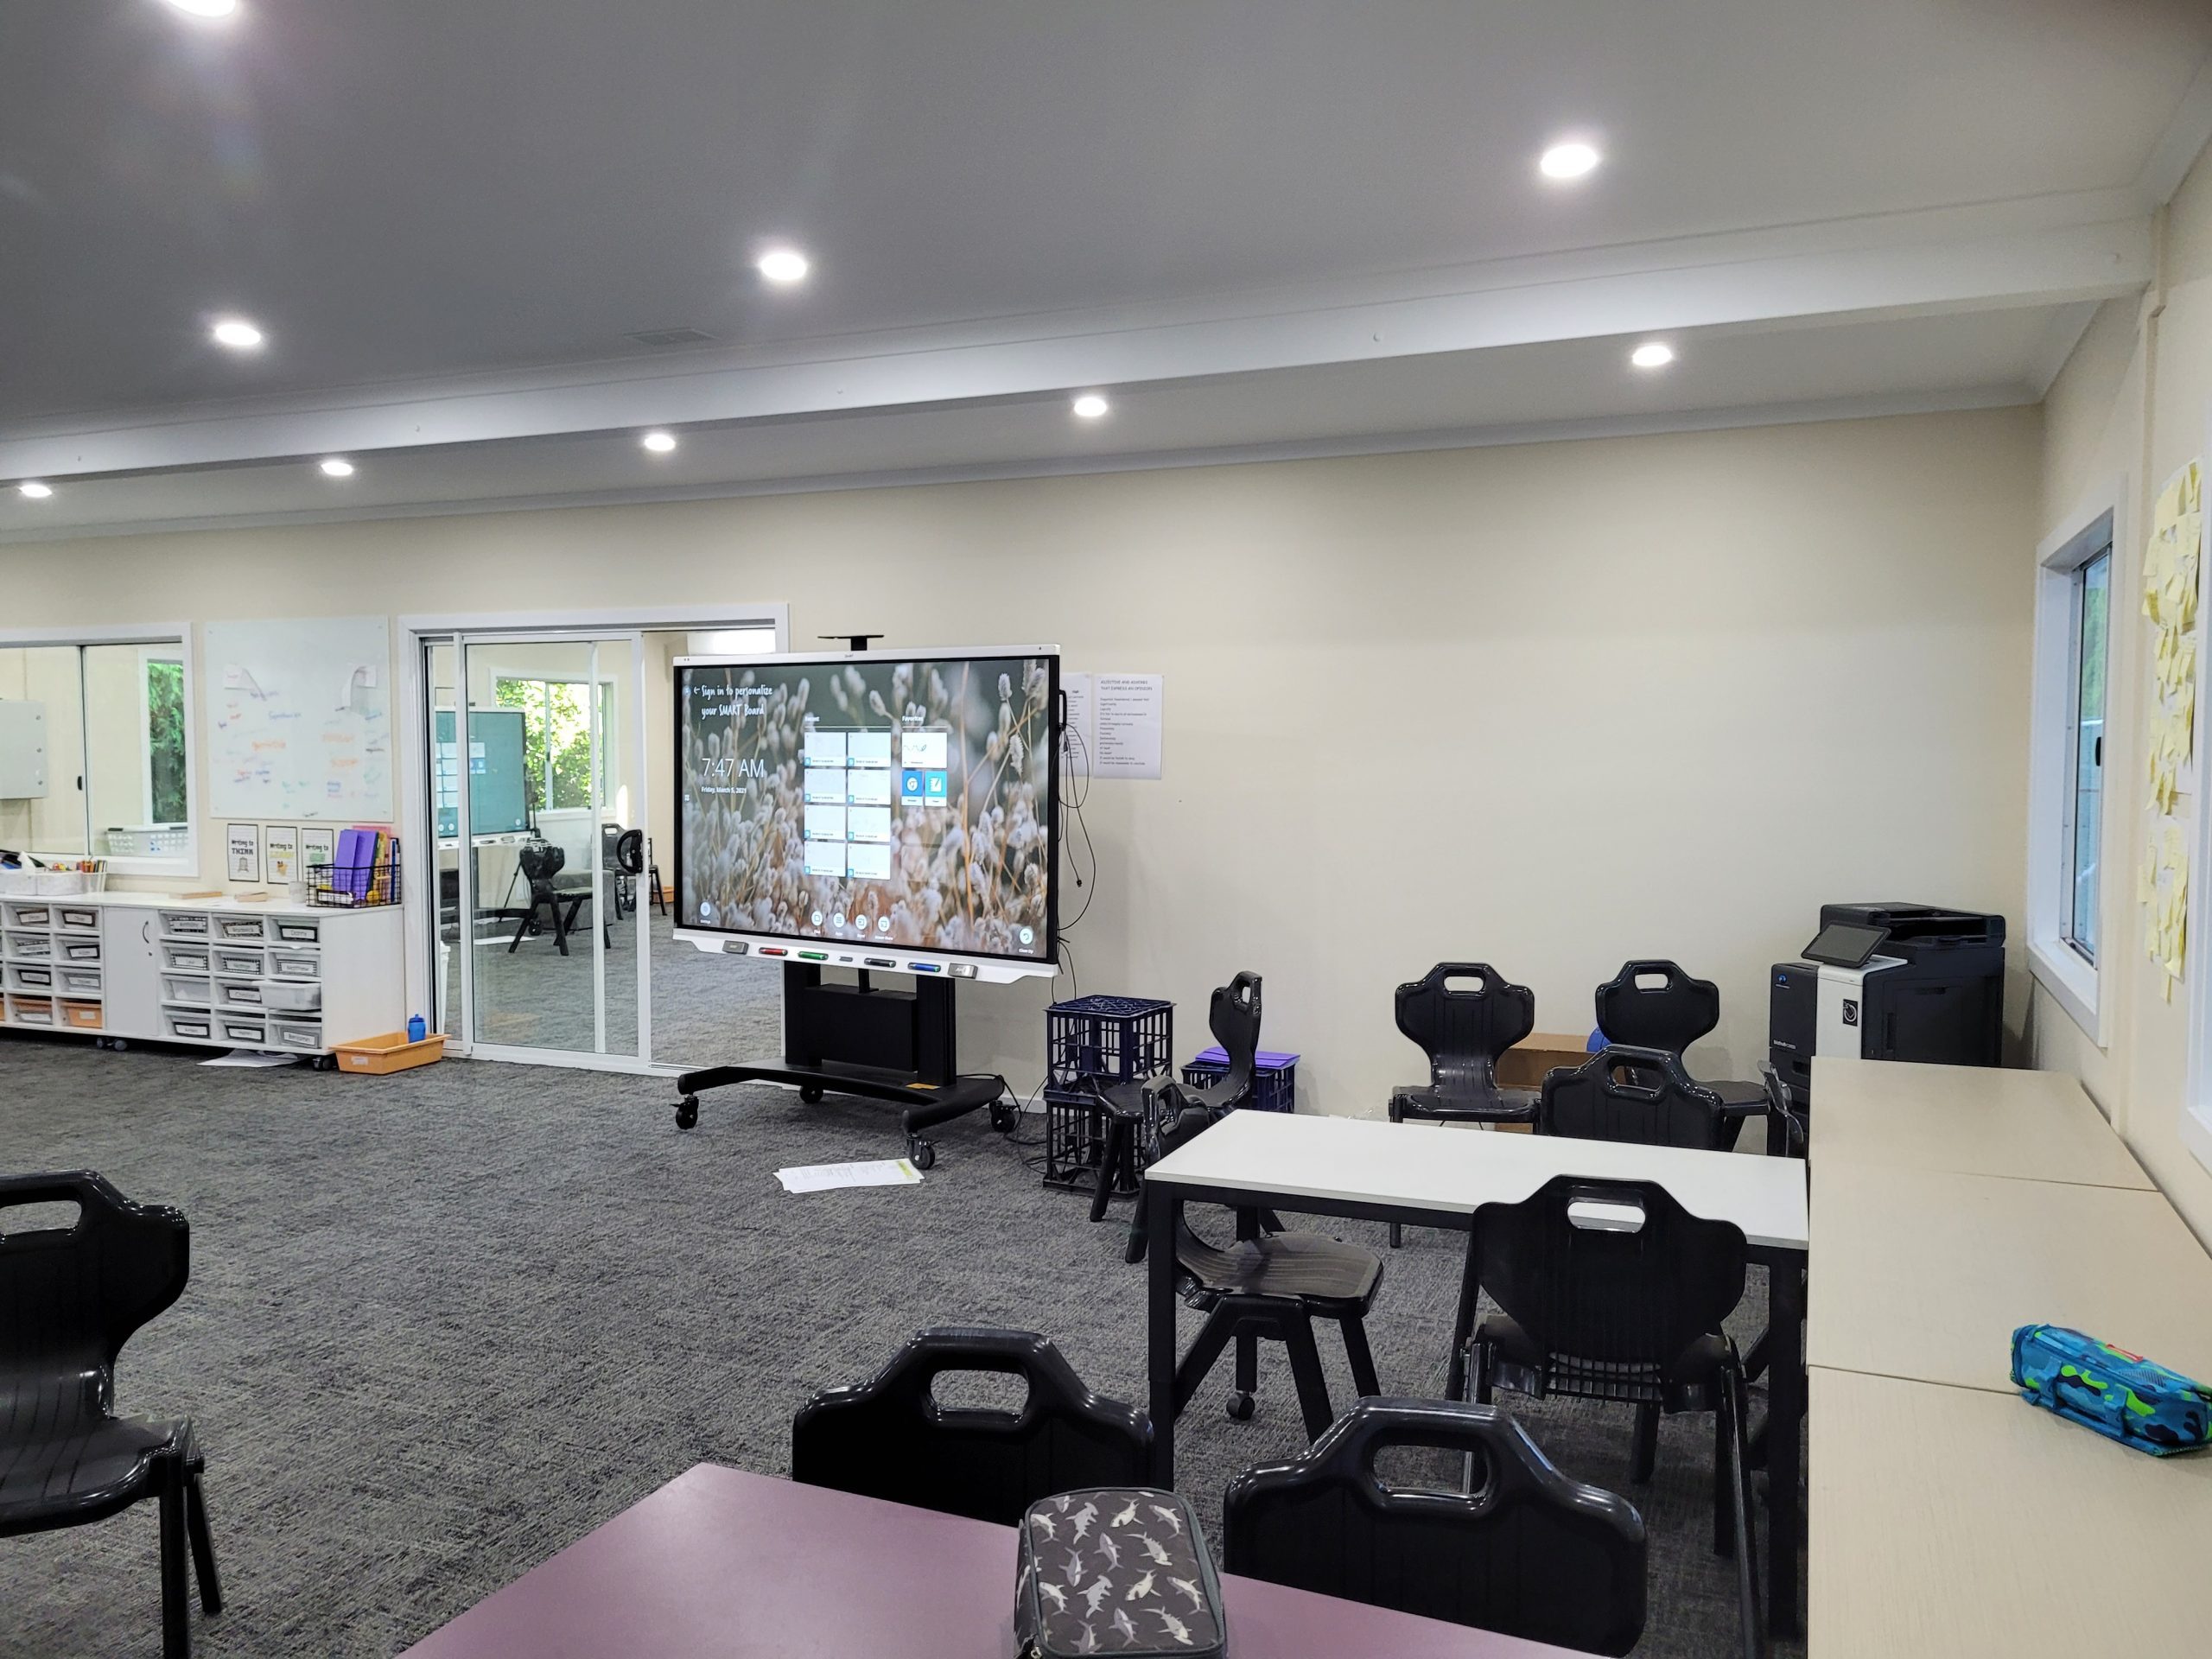 Interior demountable classroom